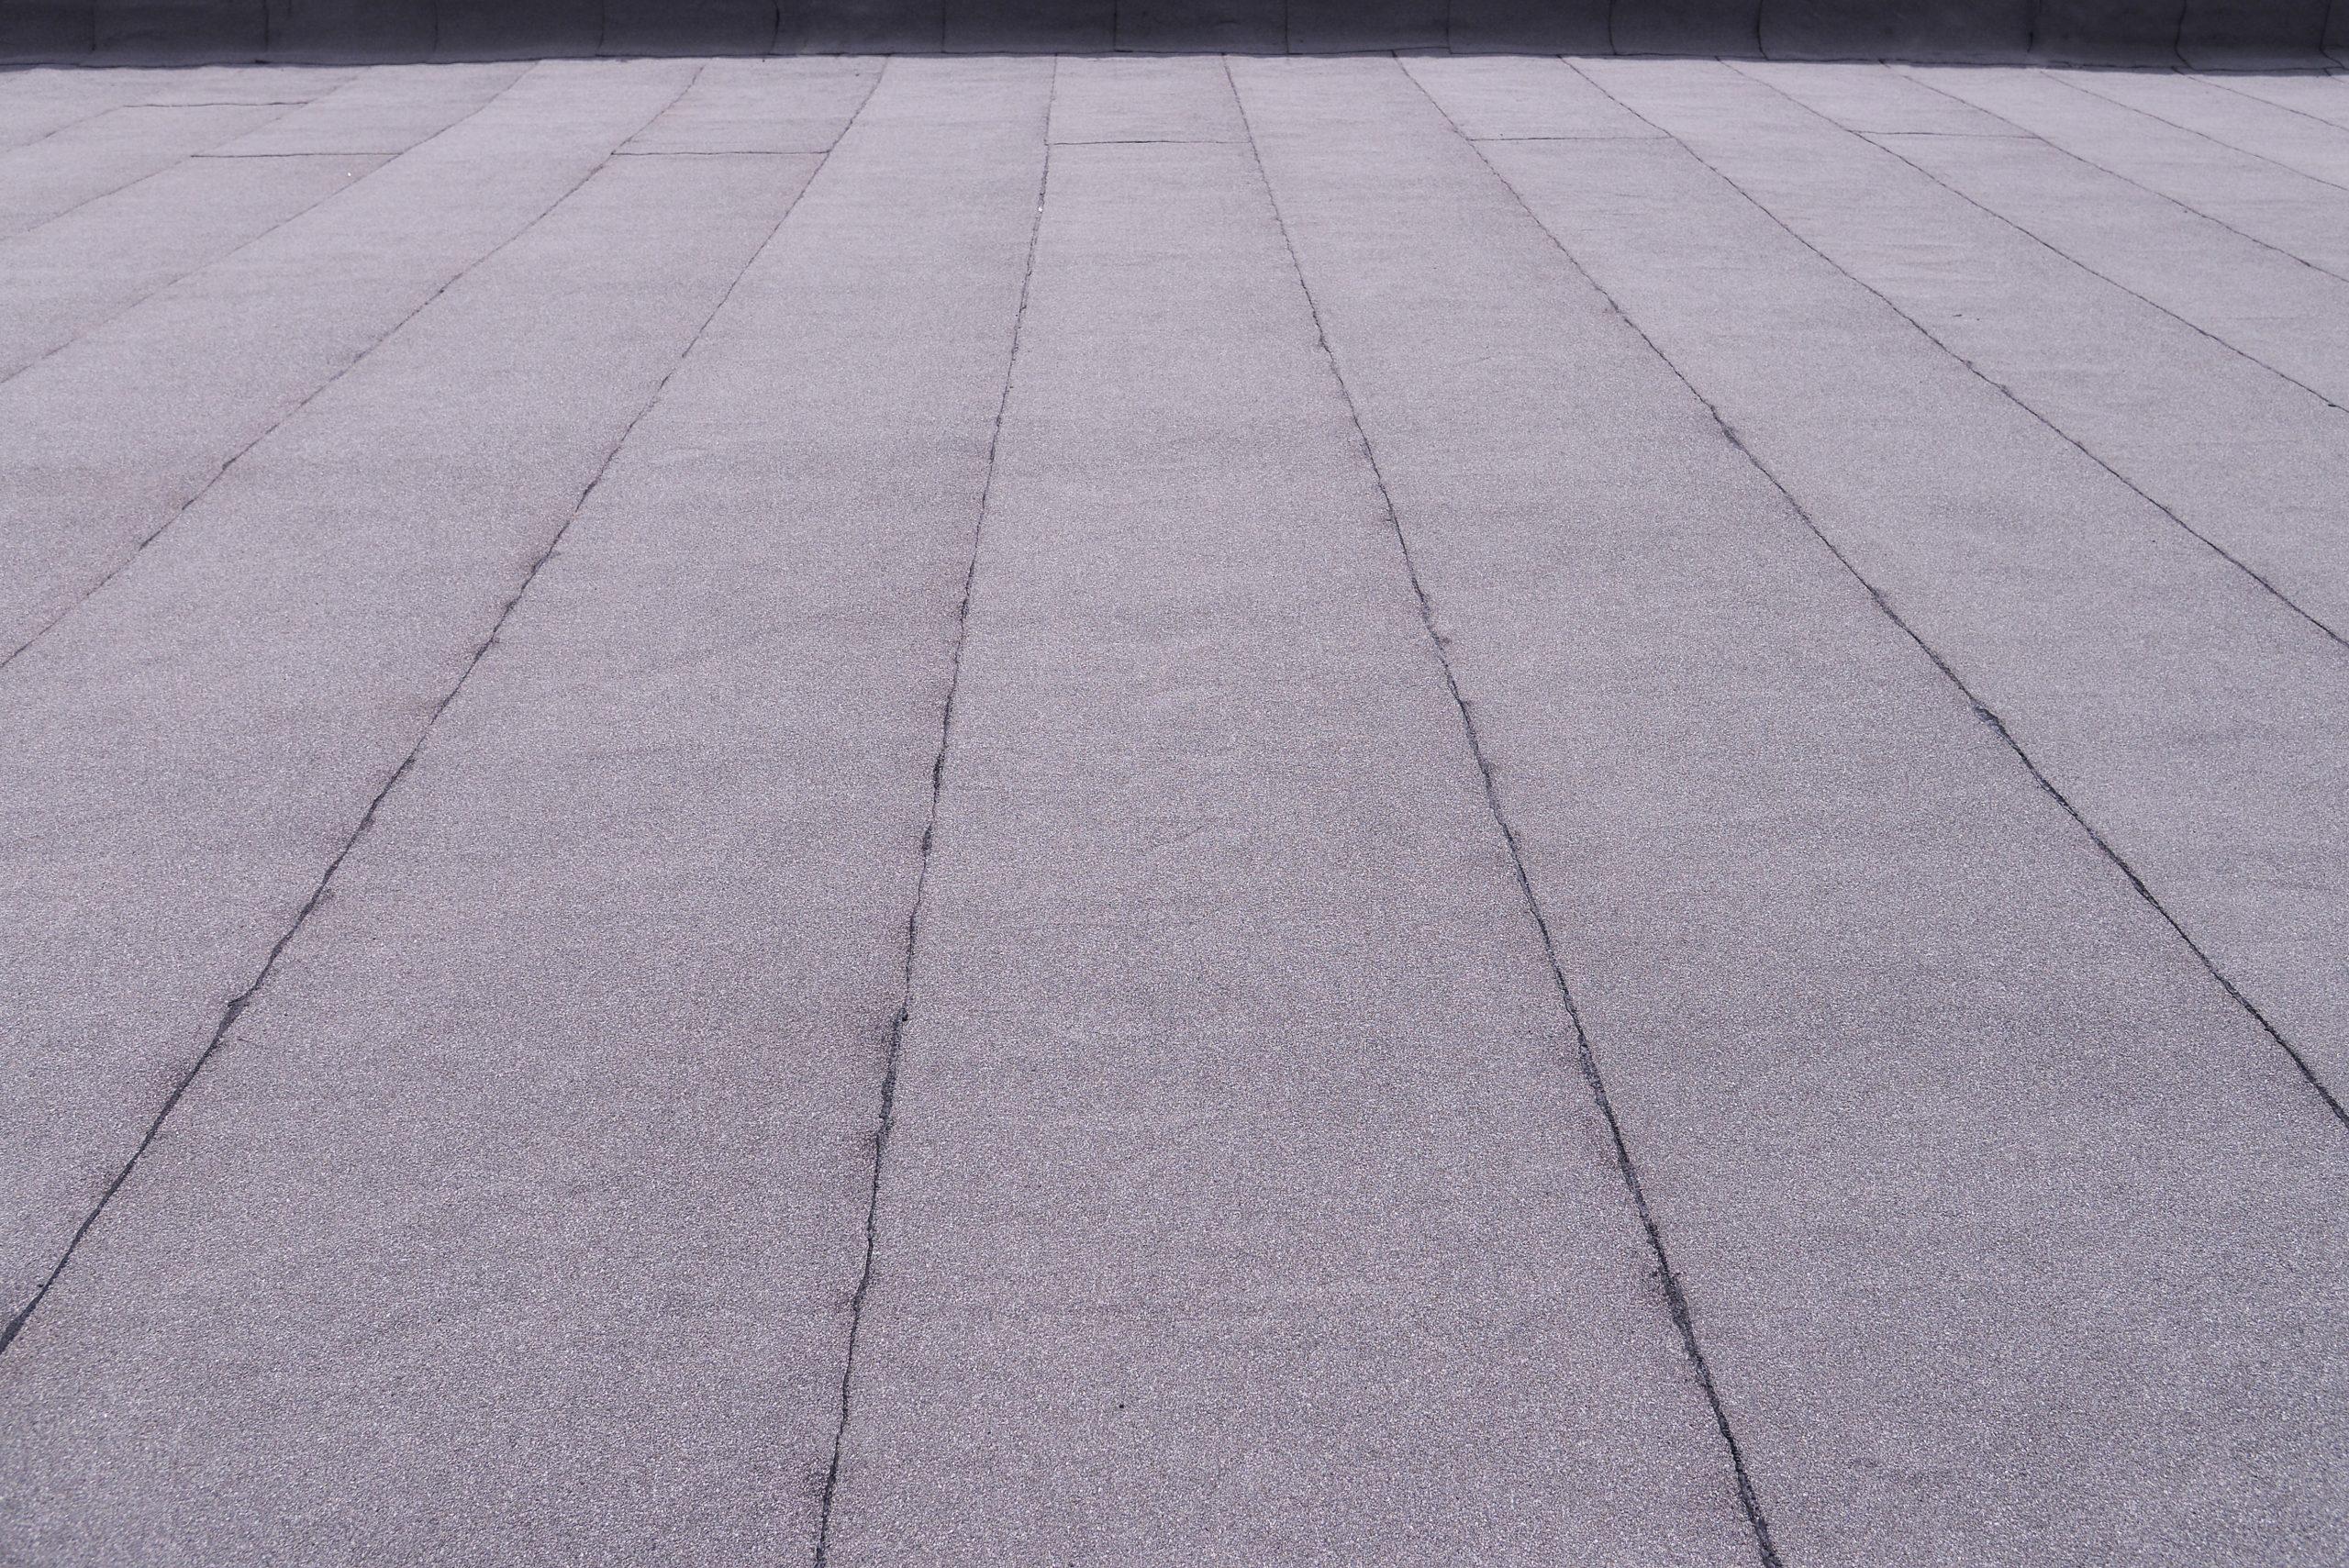 Flat surfaced roof coating. Heating and melting bitumen roofing felt background pattern